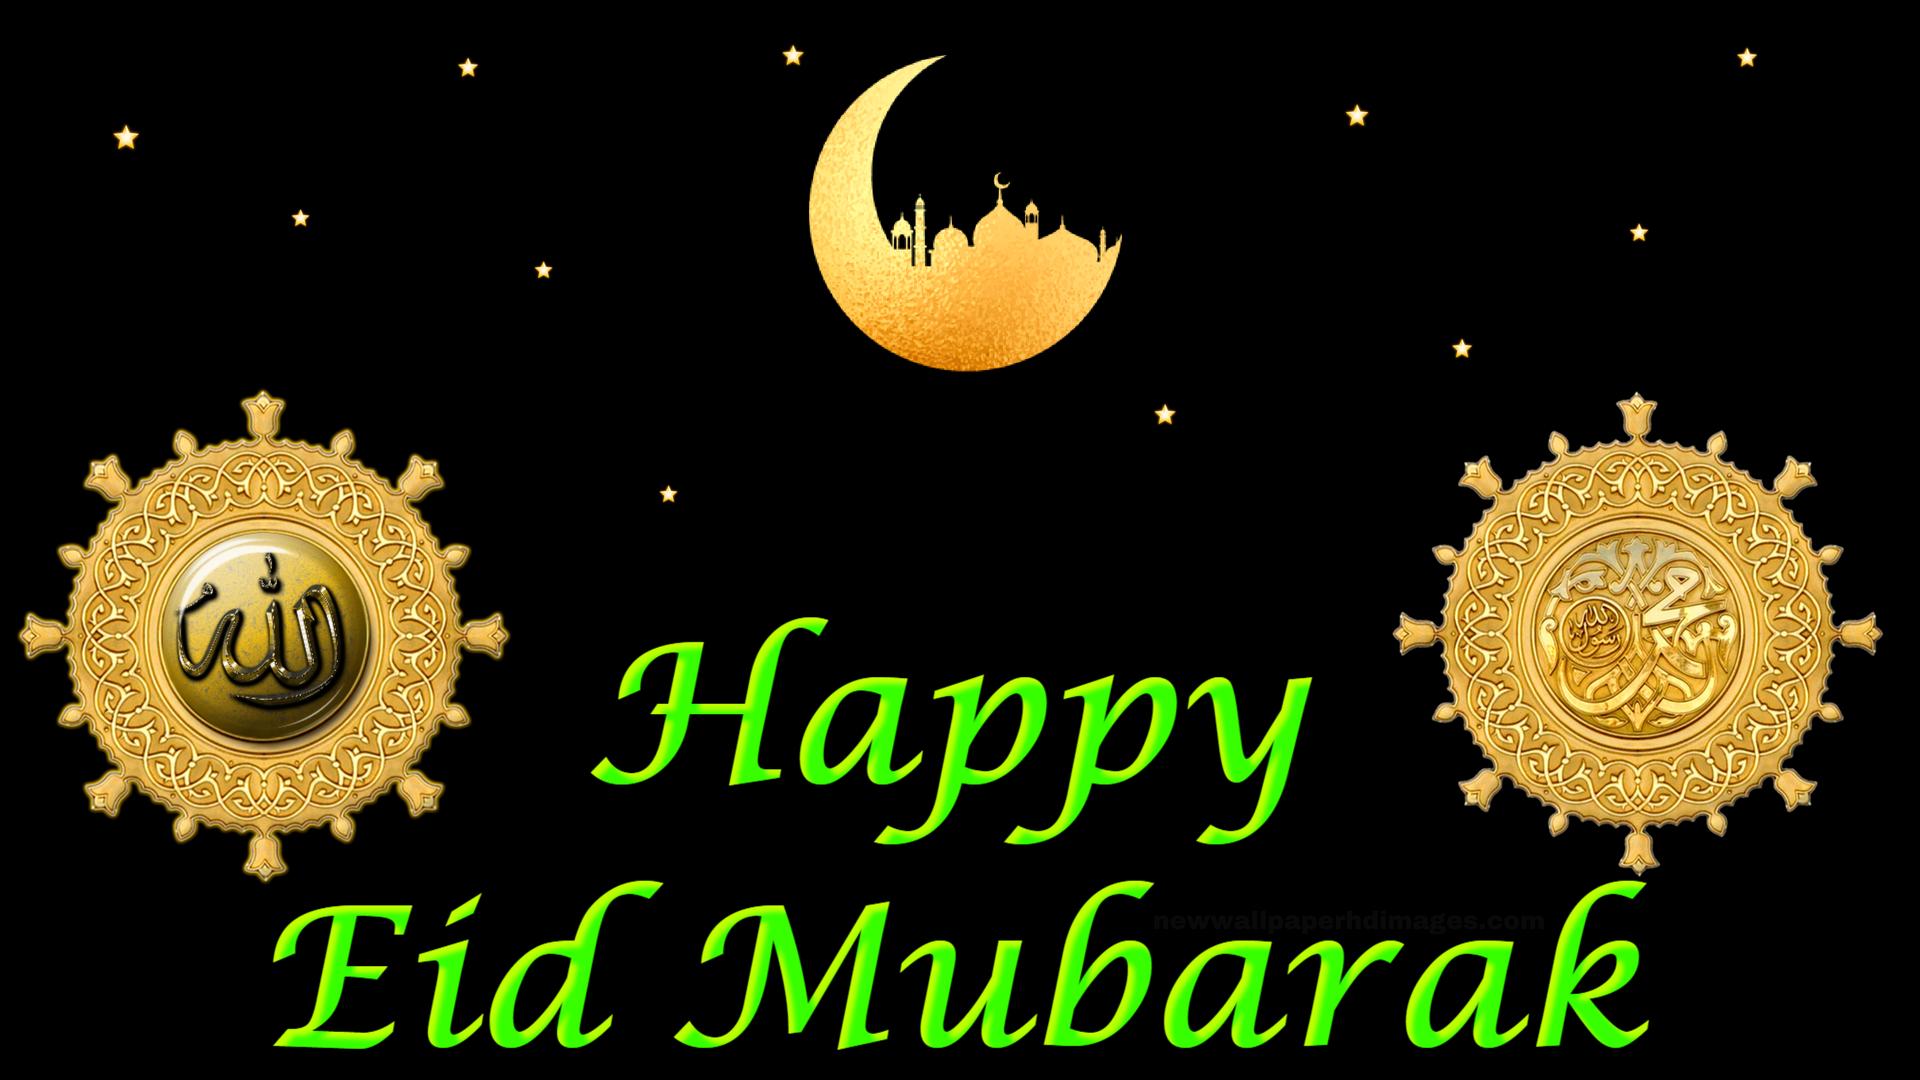 Happy Eid Mubarak Images Wallpaper